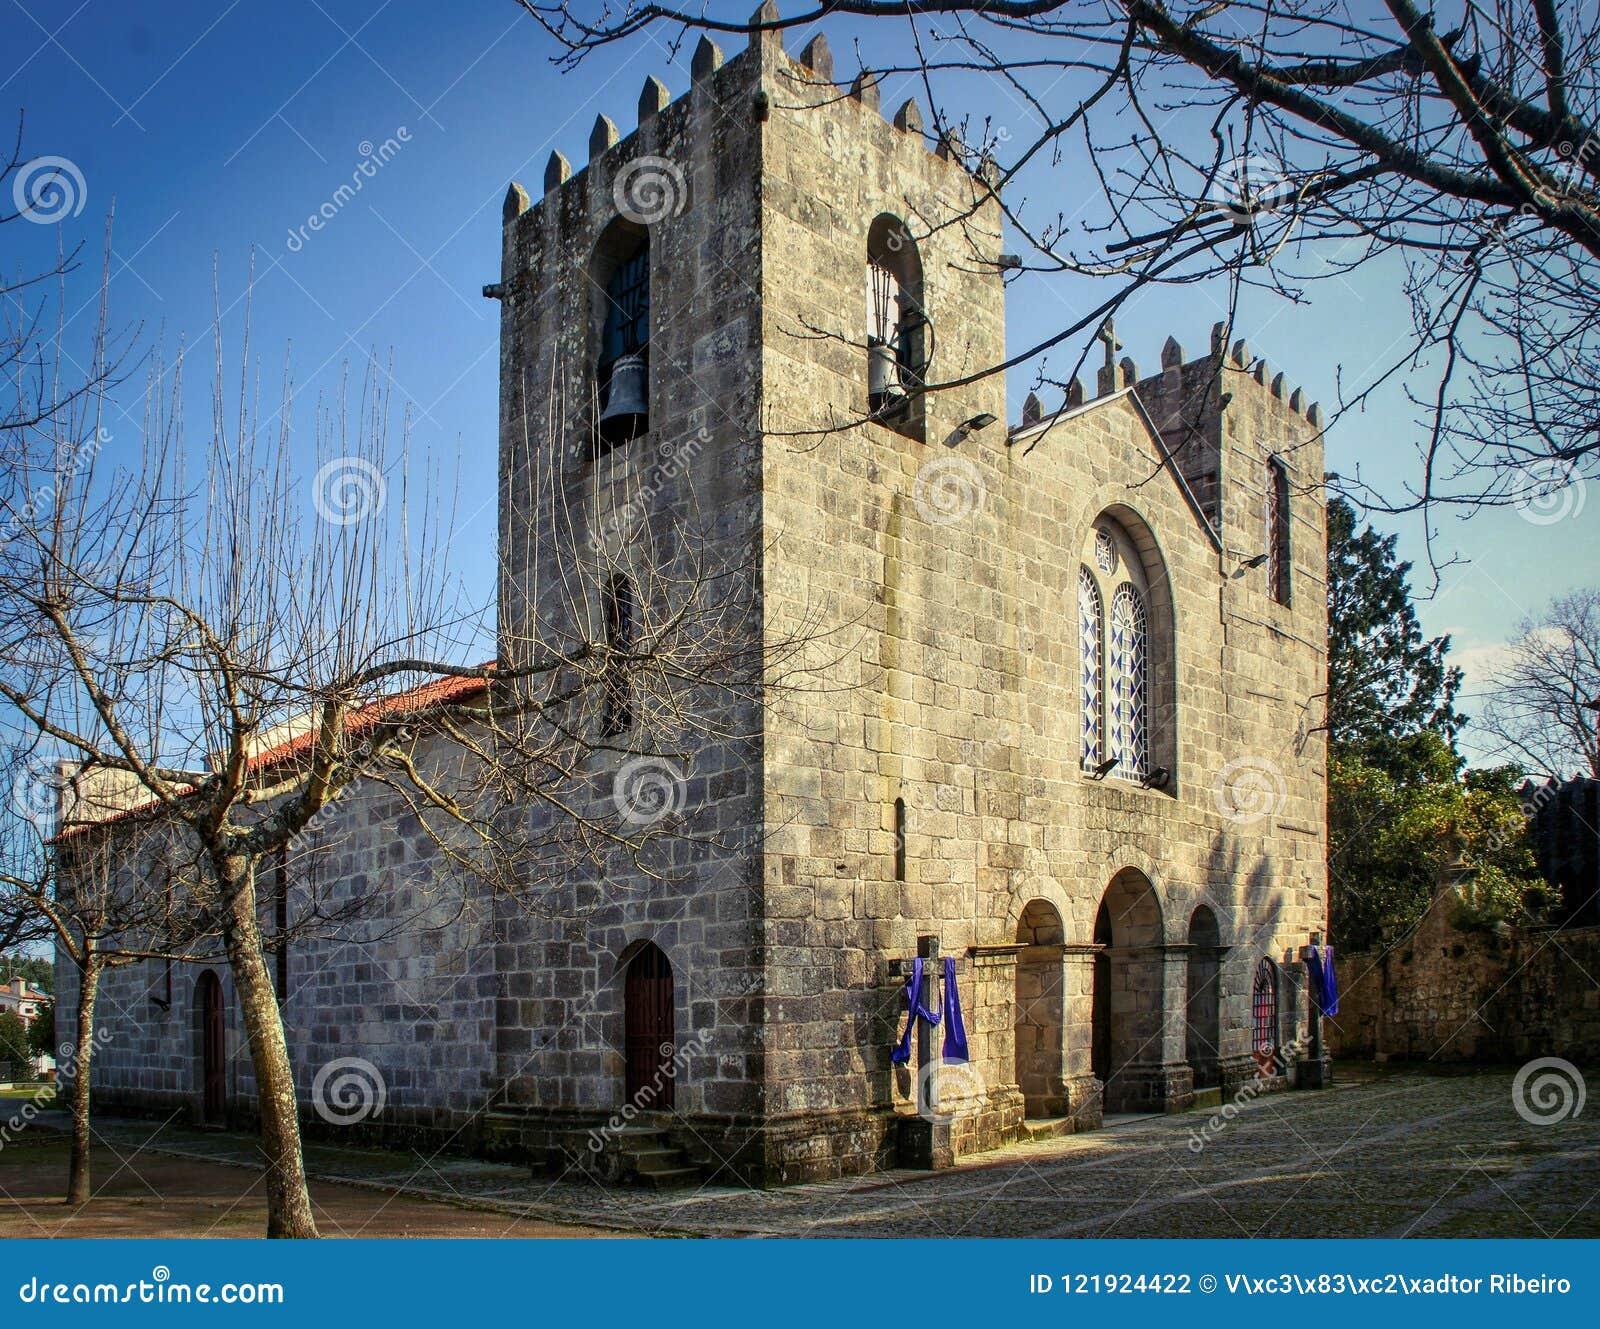 Pedroso monastery in Vila Nova de Gaia